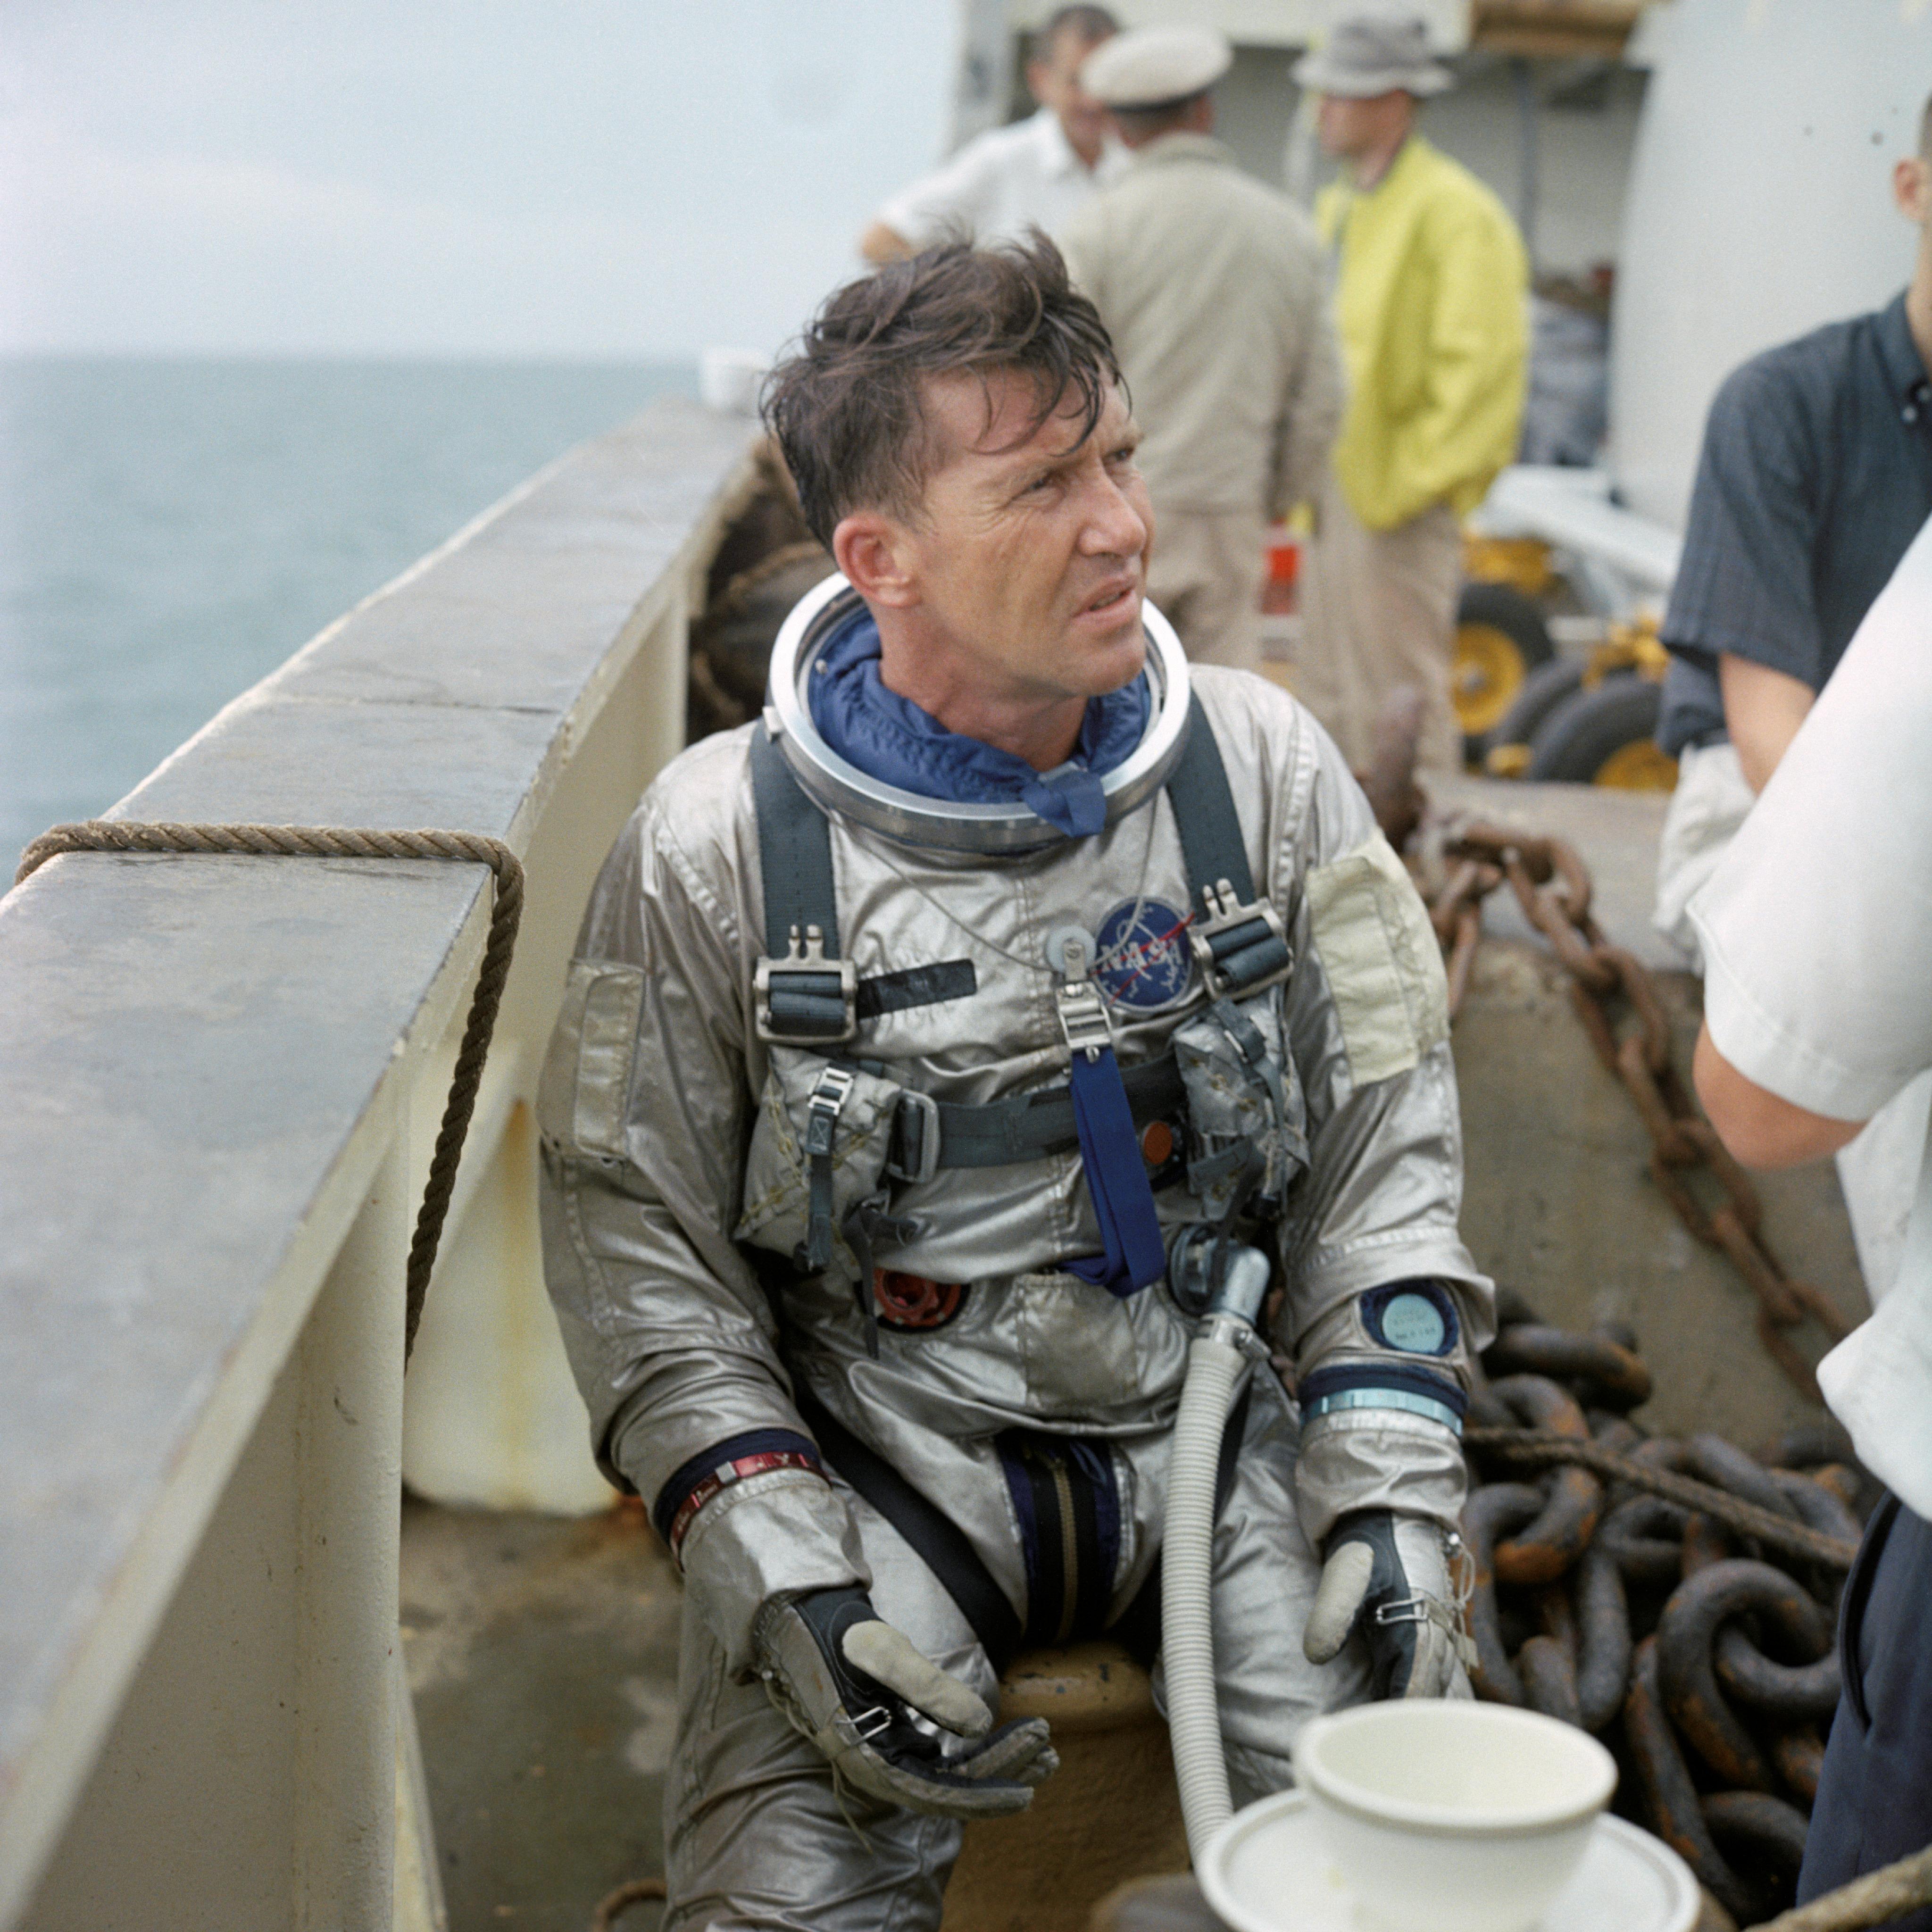 Gemini Spacesuit Image Gallery | NASA